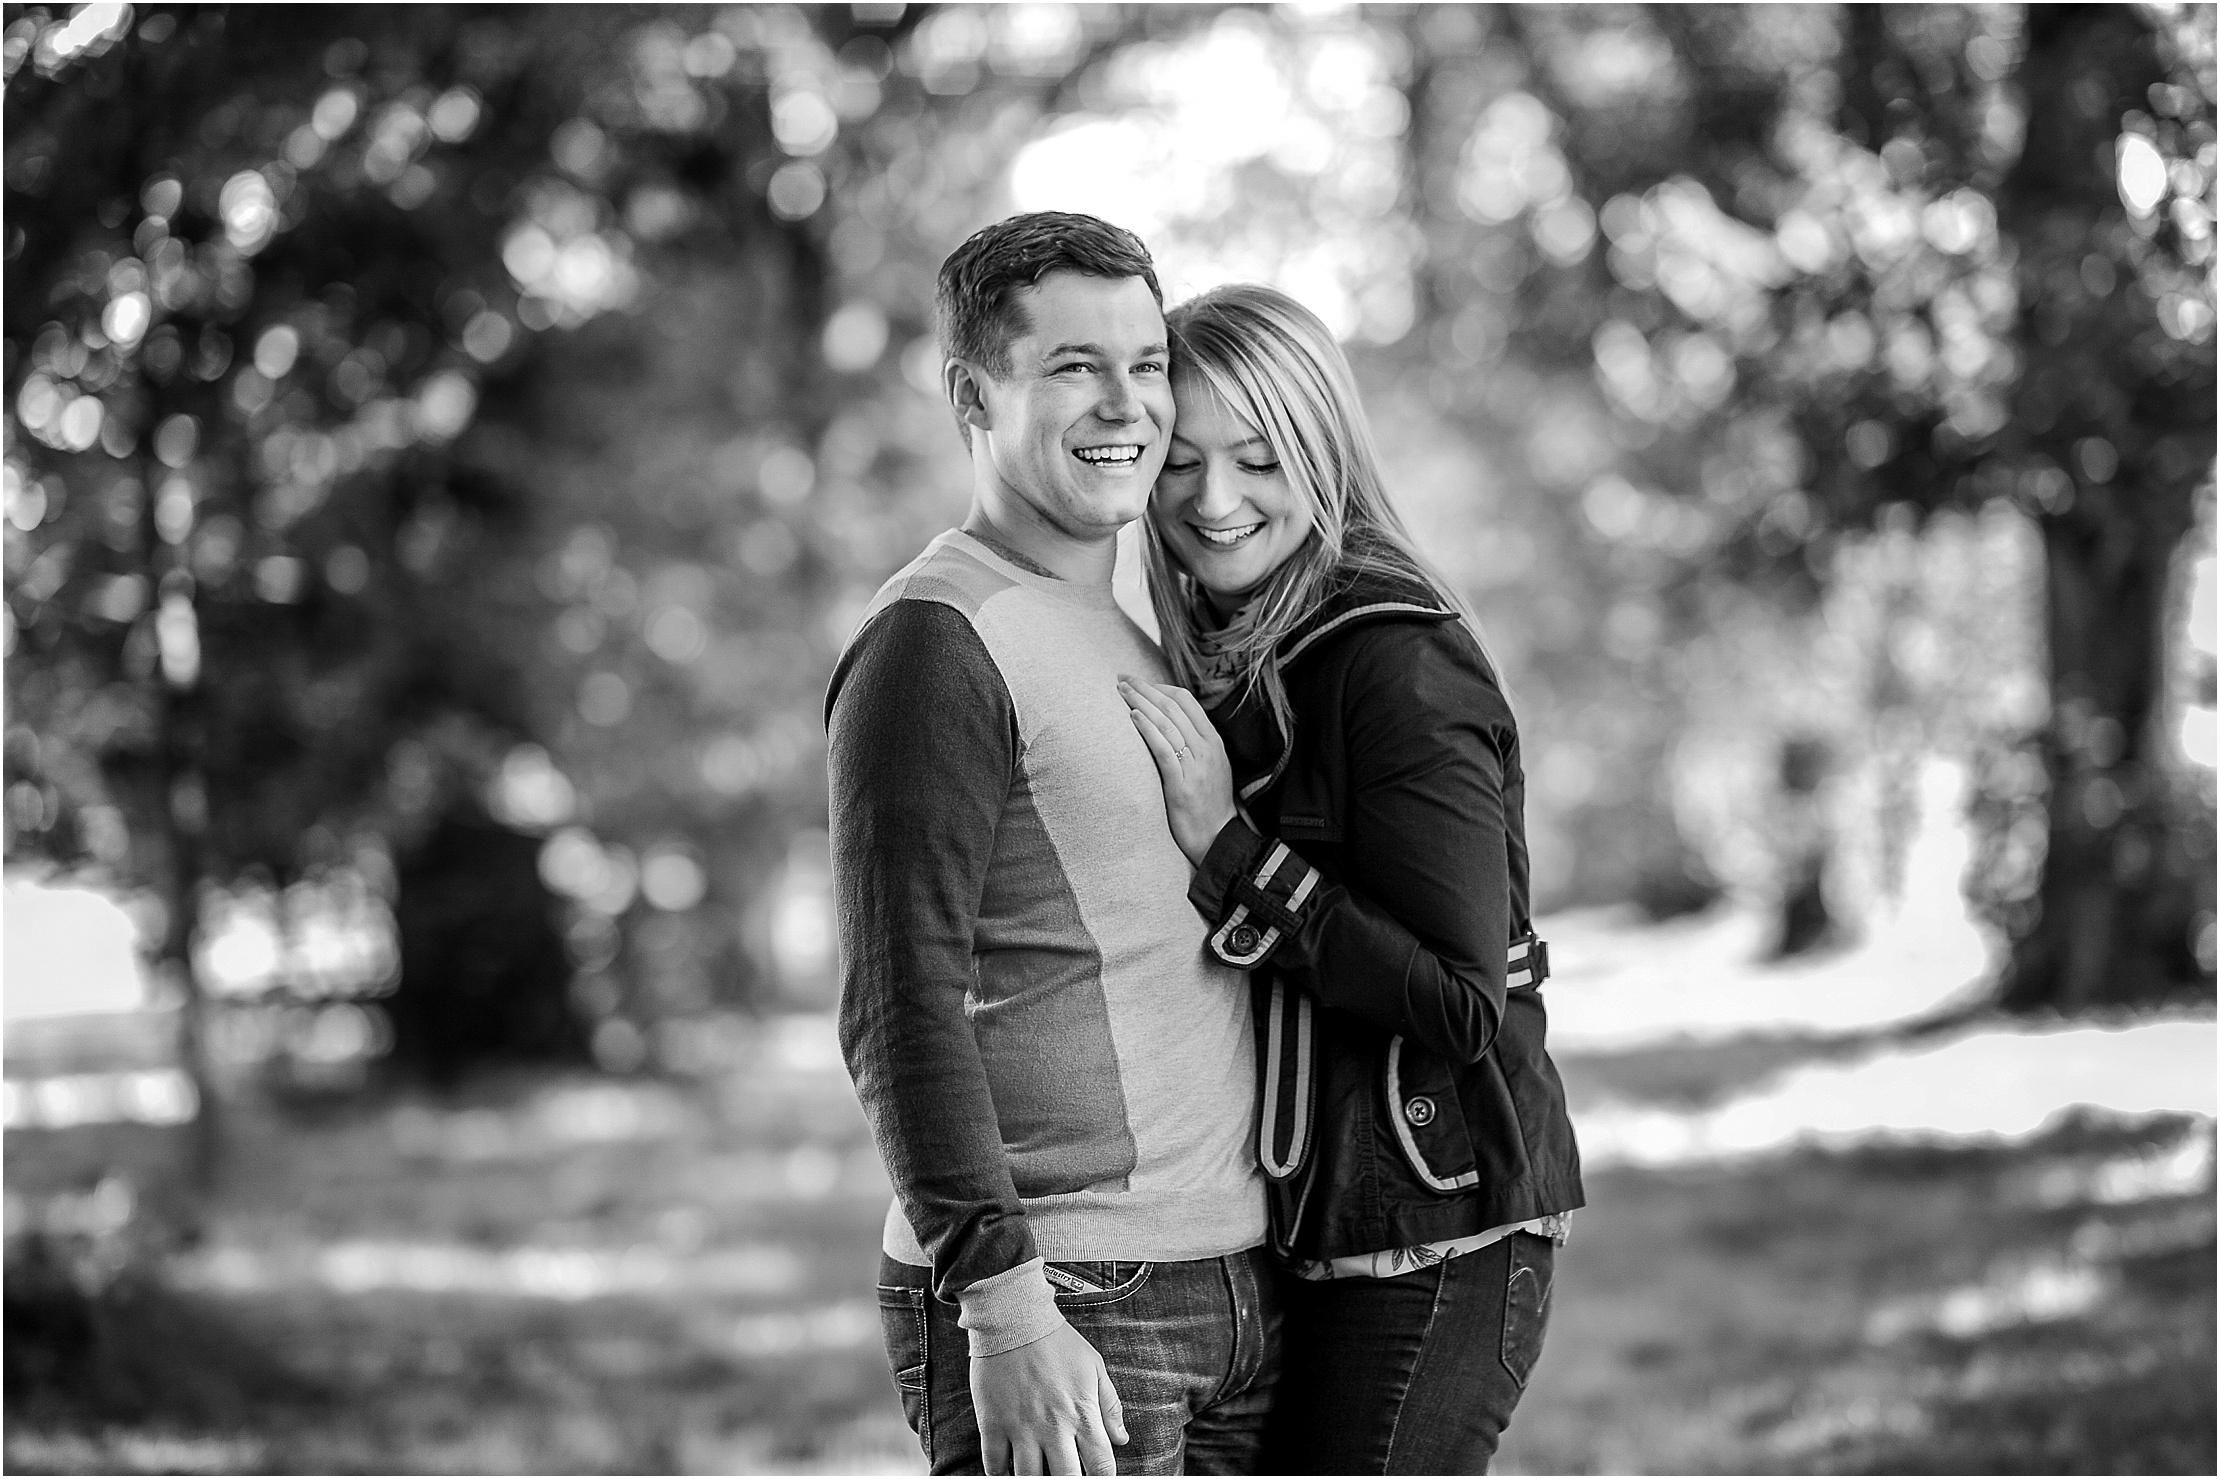 townley-park-pre-wedding-photography-01.jpg